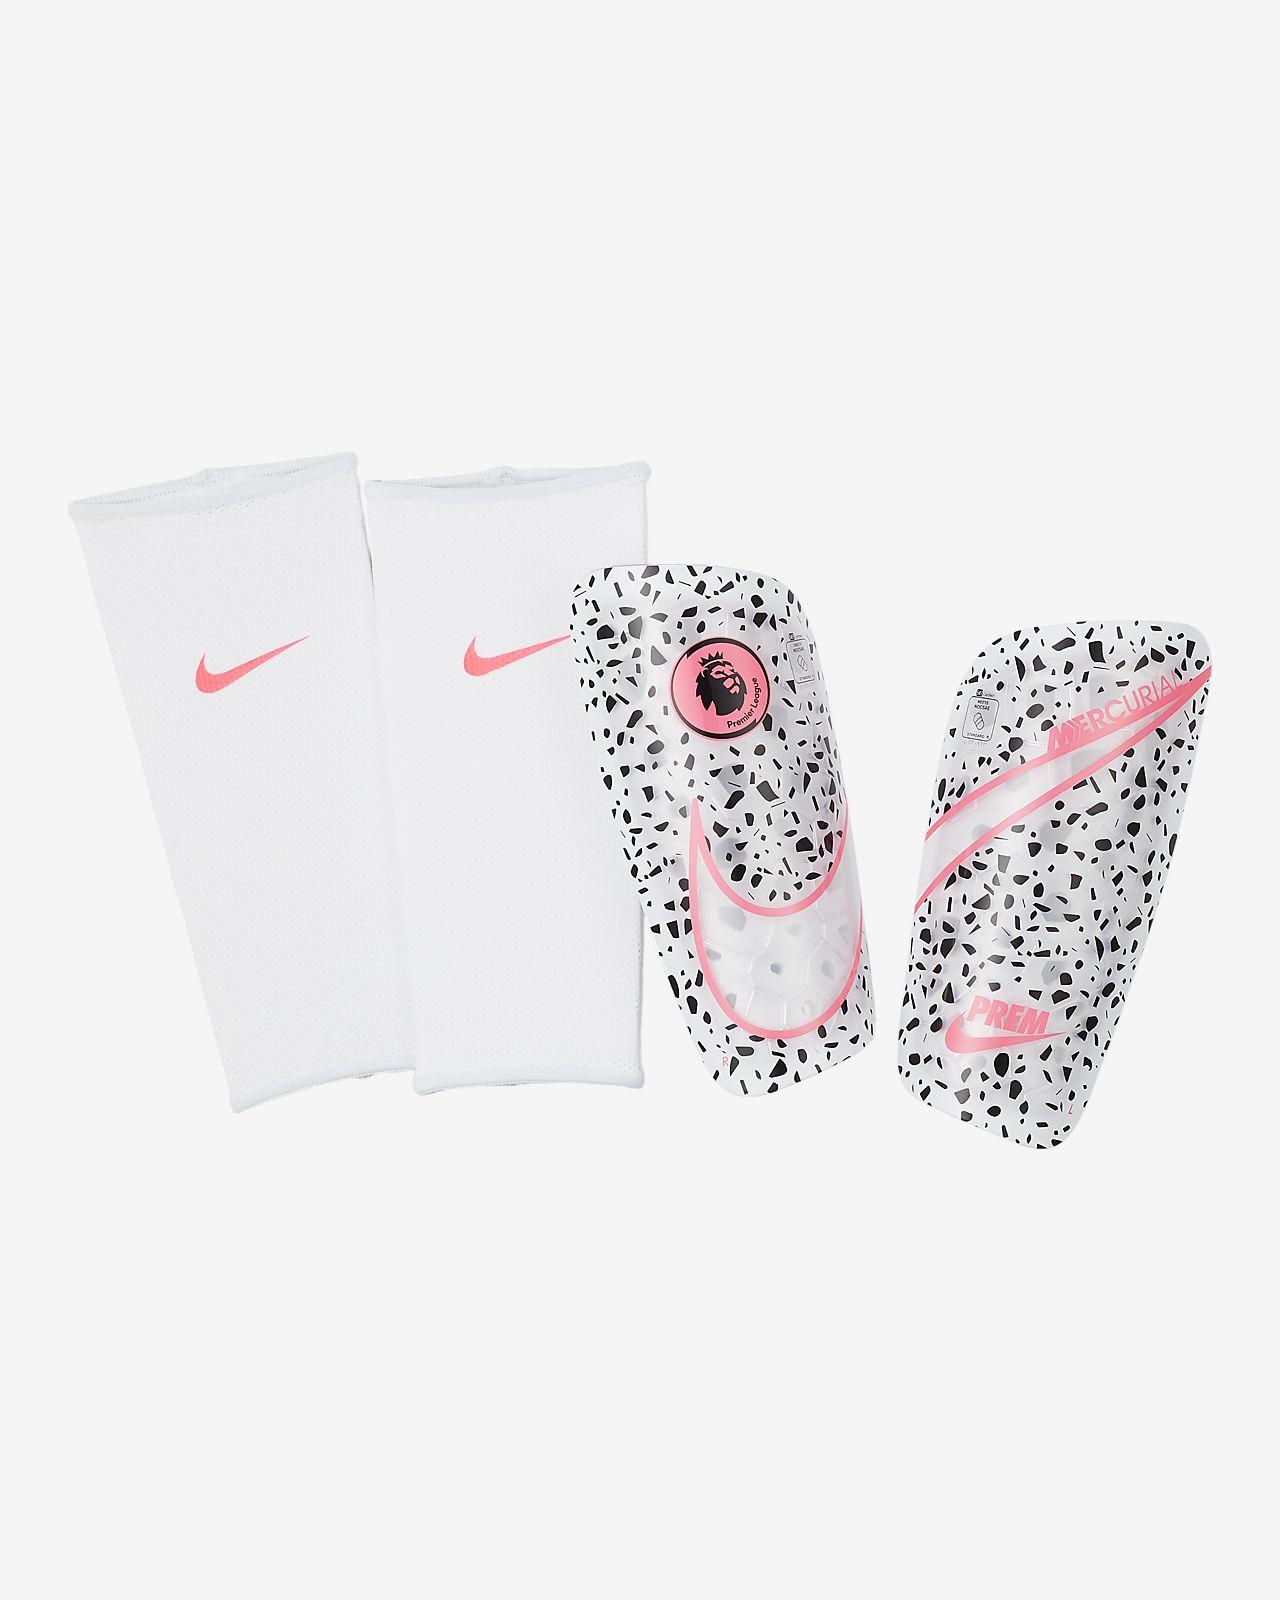 Nike Mercurial Lite Premier League Canyelleres de futbol